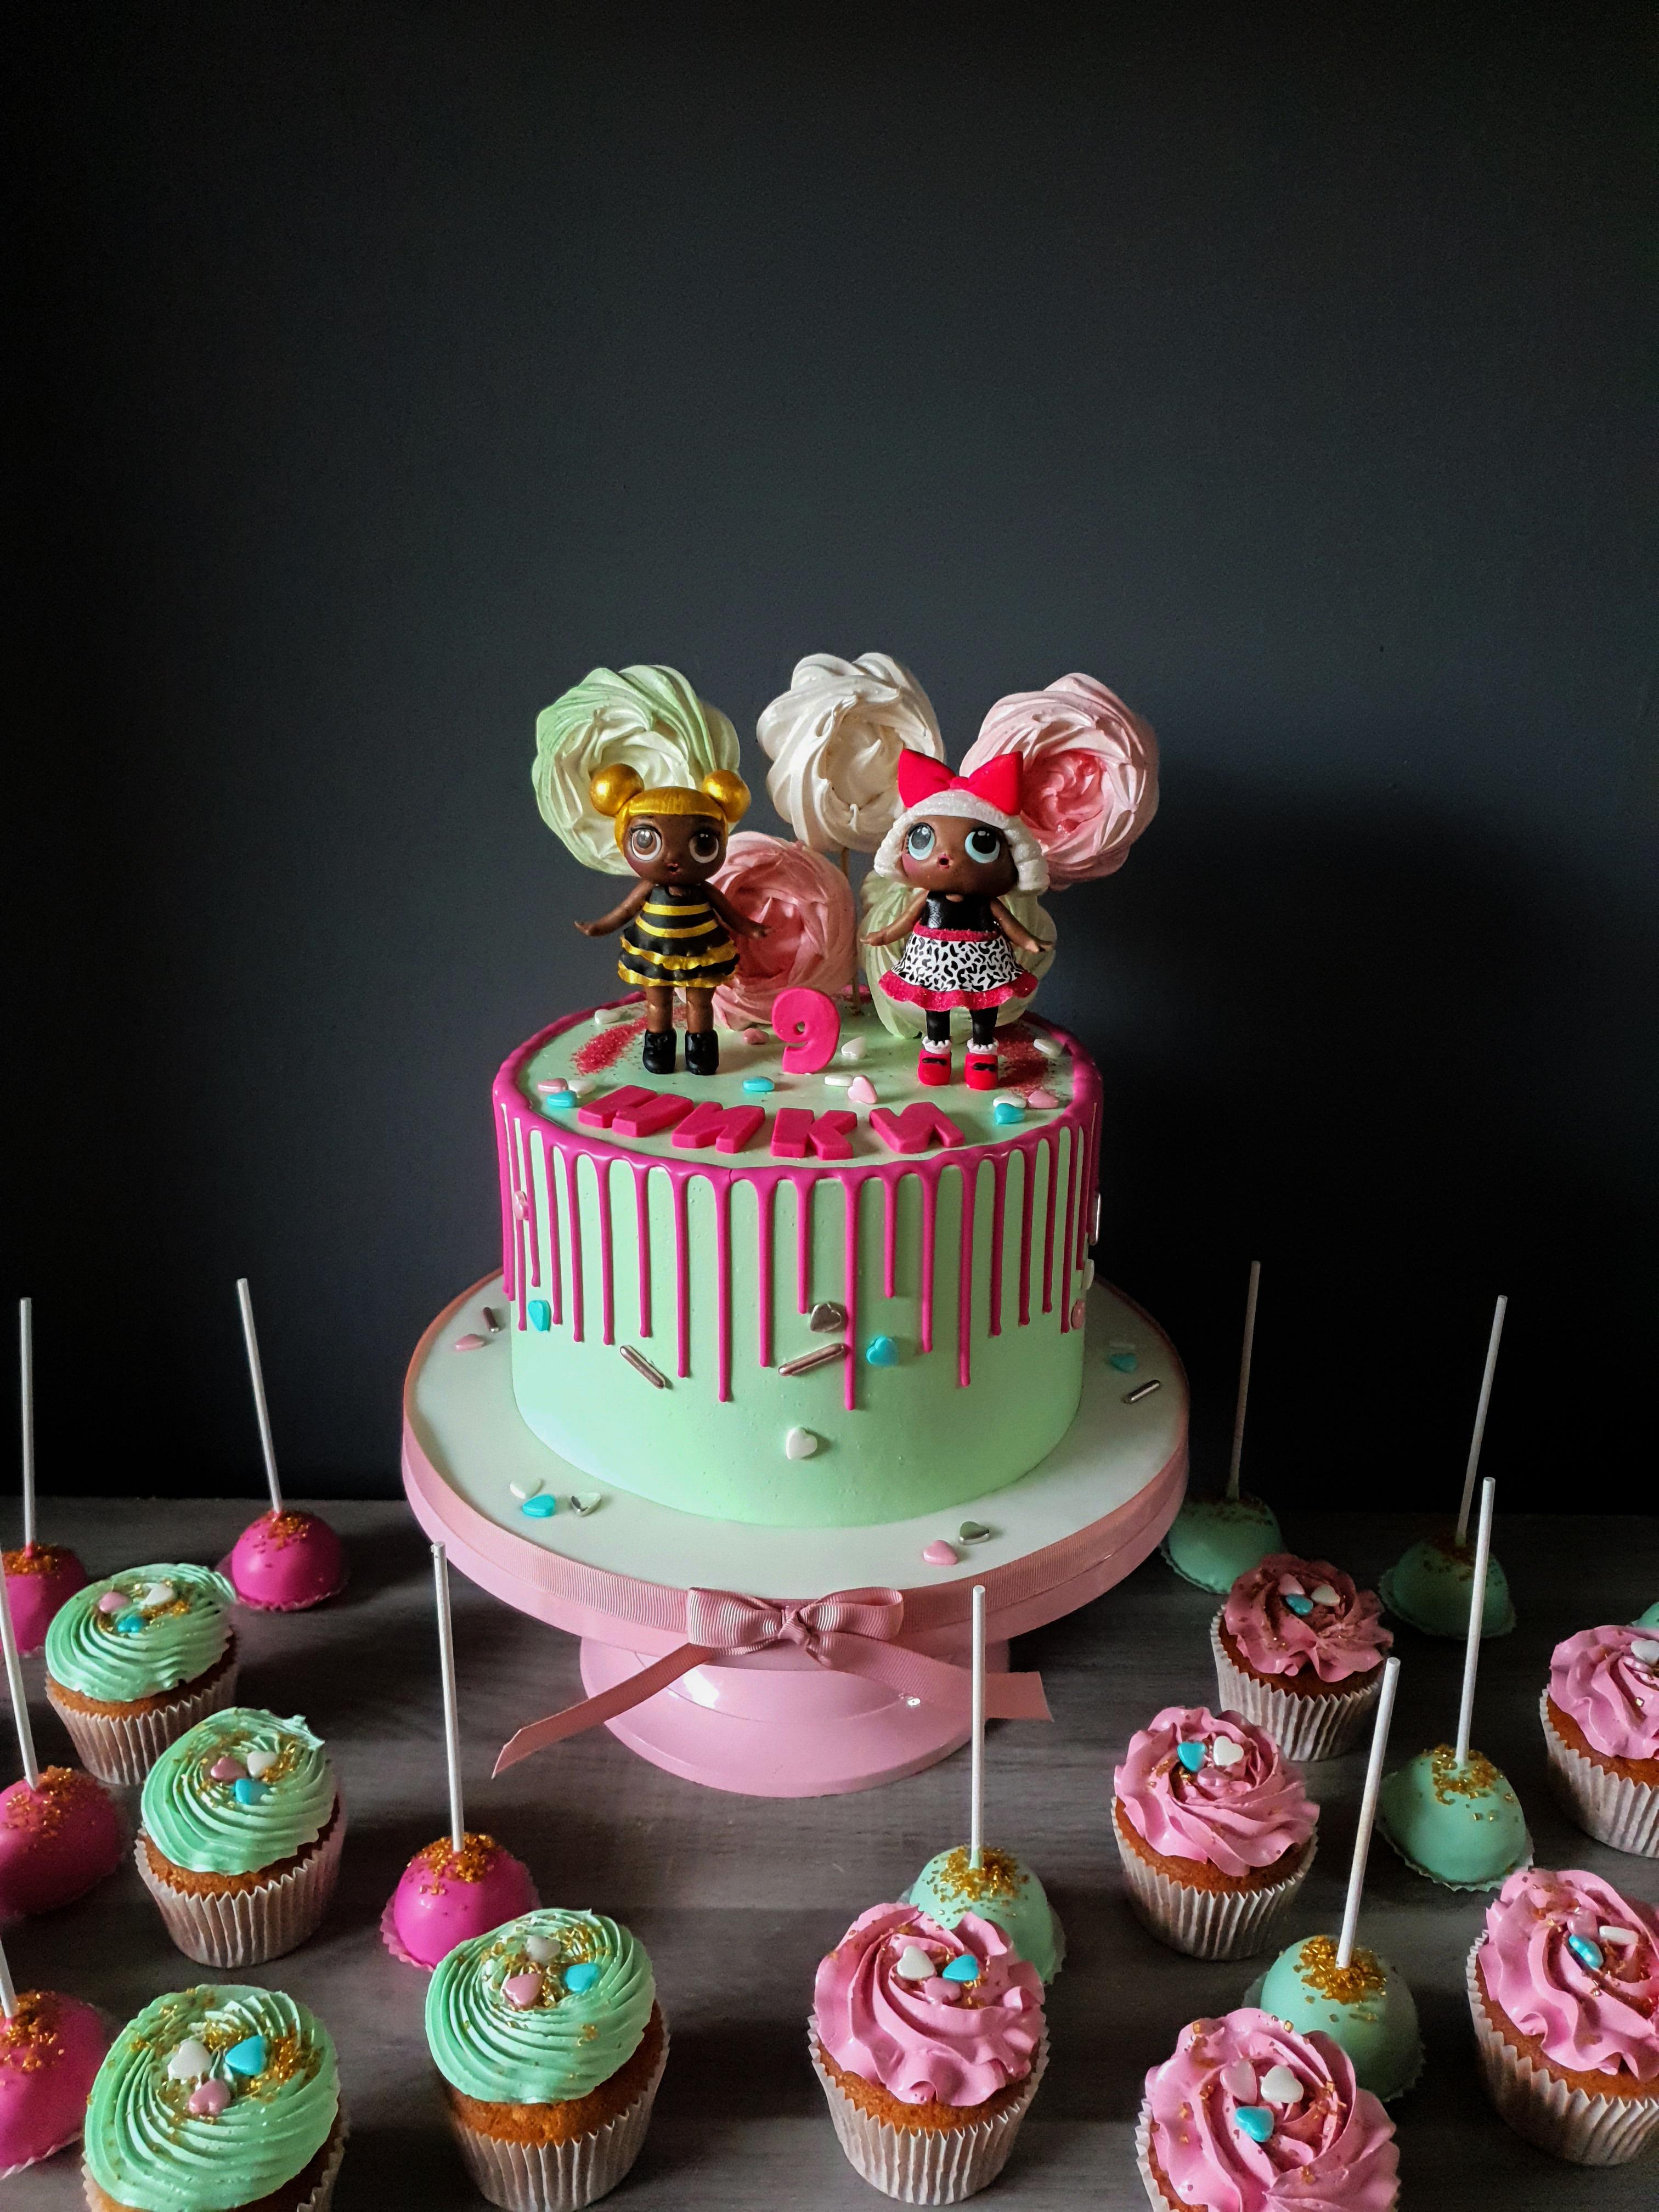 LOL Doll drip cake v.2.0